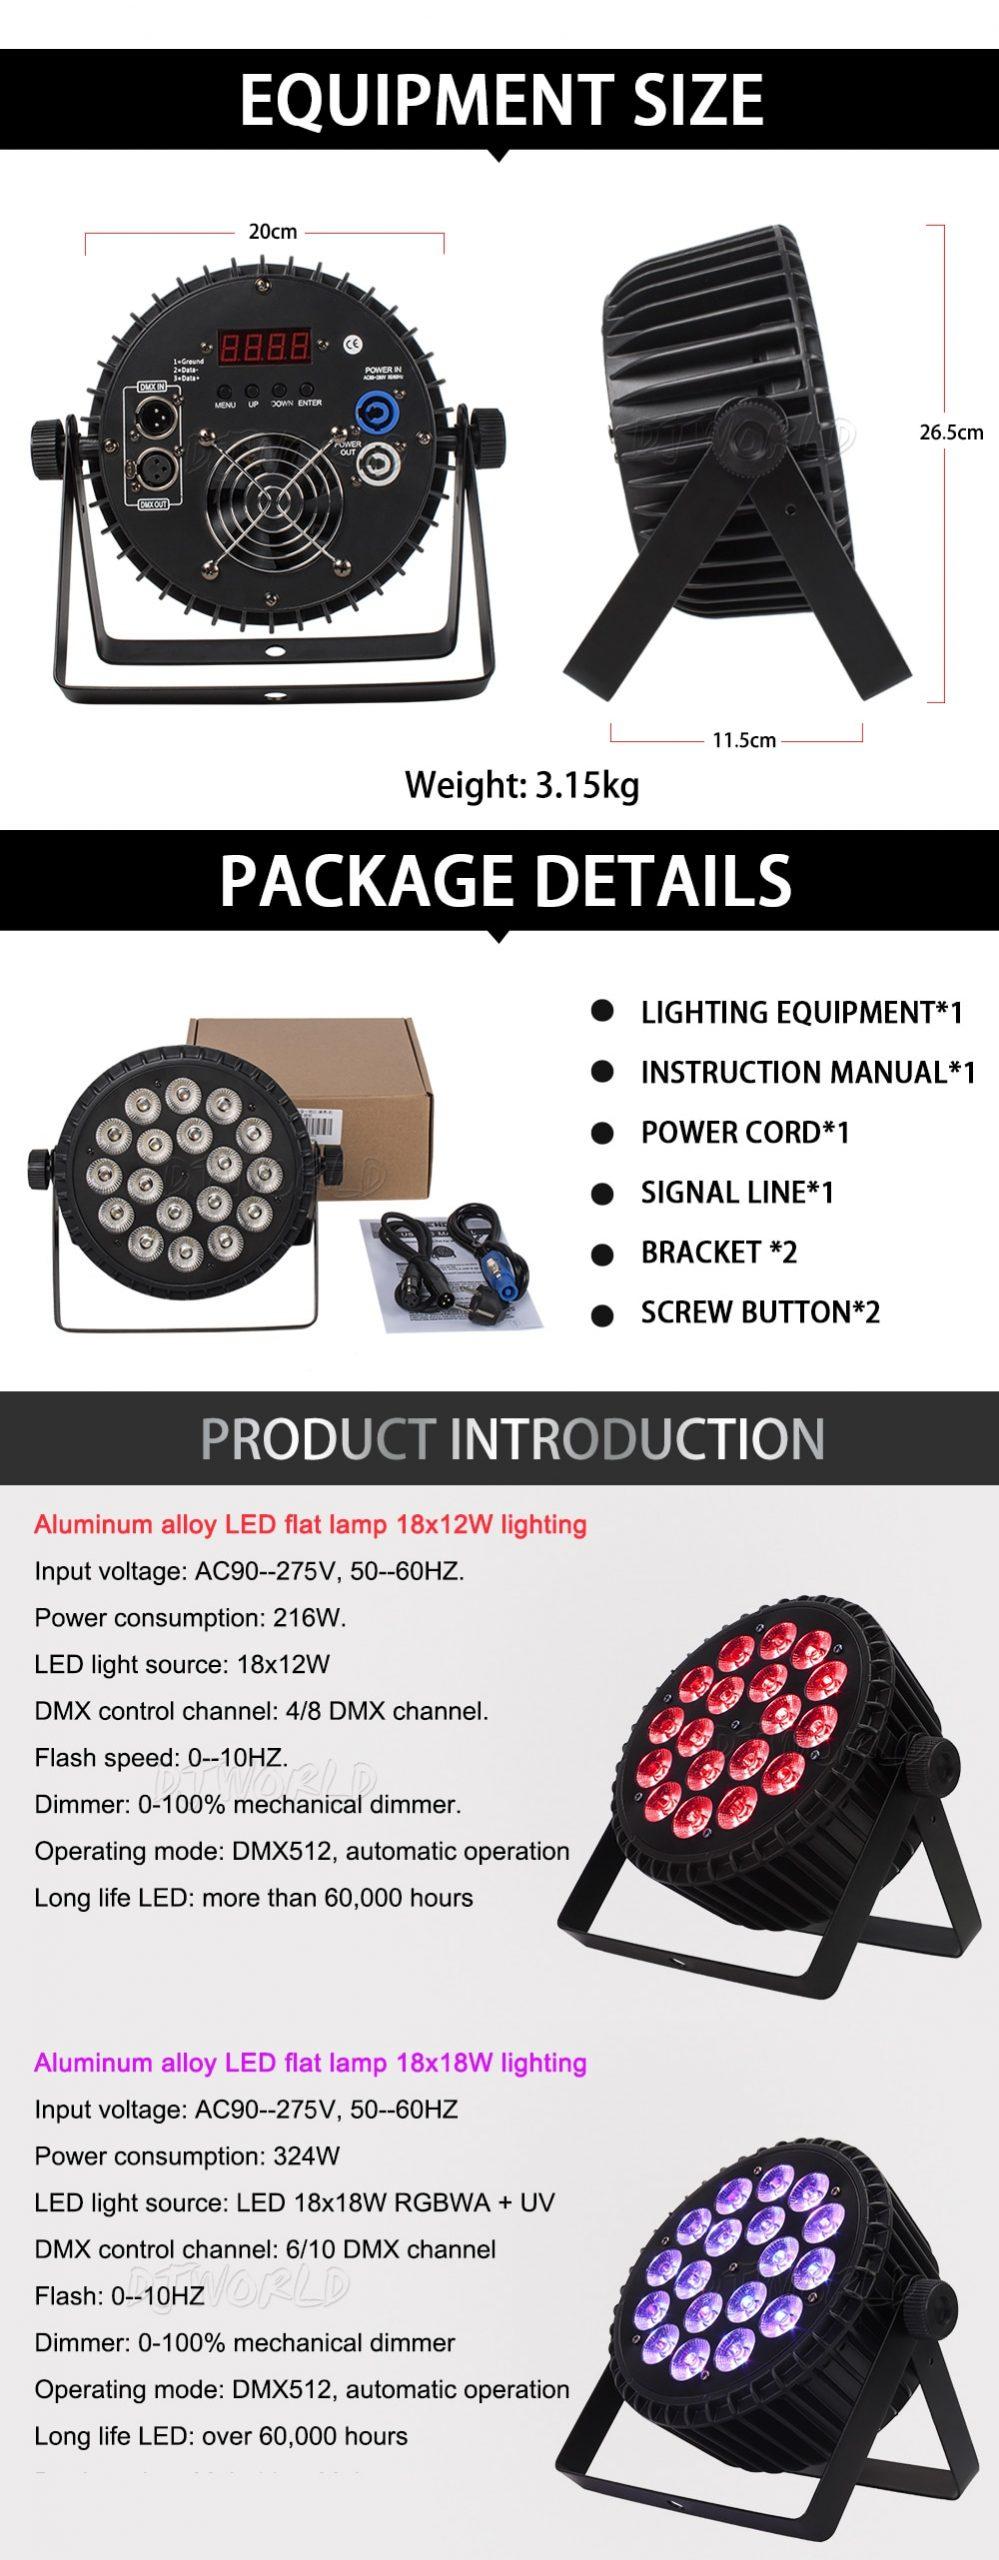 4pcs/lot Aluminum LED Par 18x18W/18x12W RGBWA+UV Light DMX 512 Control Stage Effect Lighting For Dj Disco Theater Party Lights